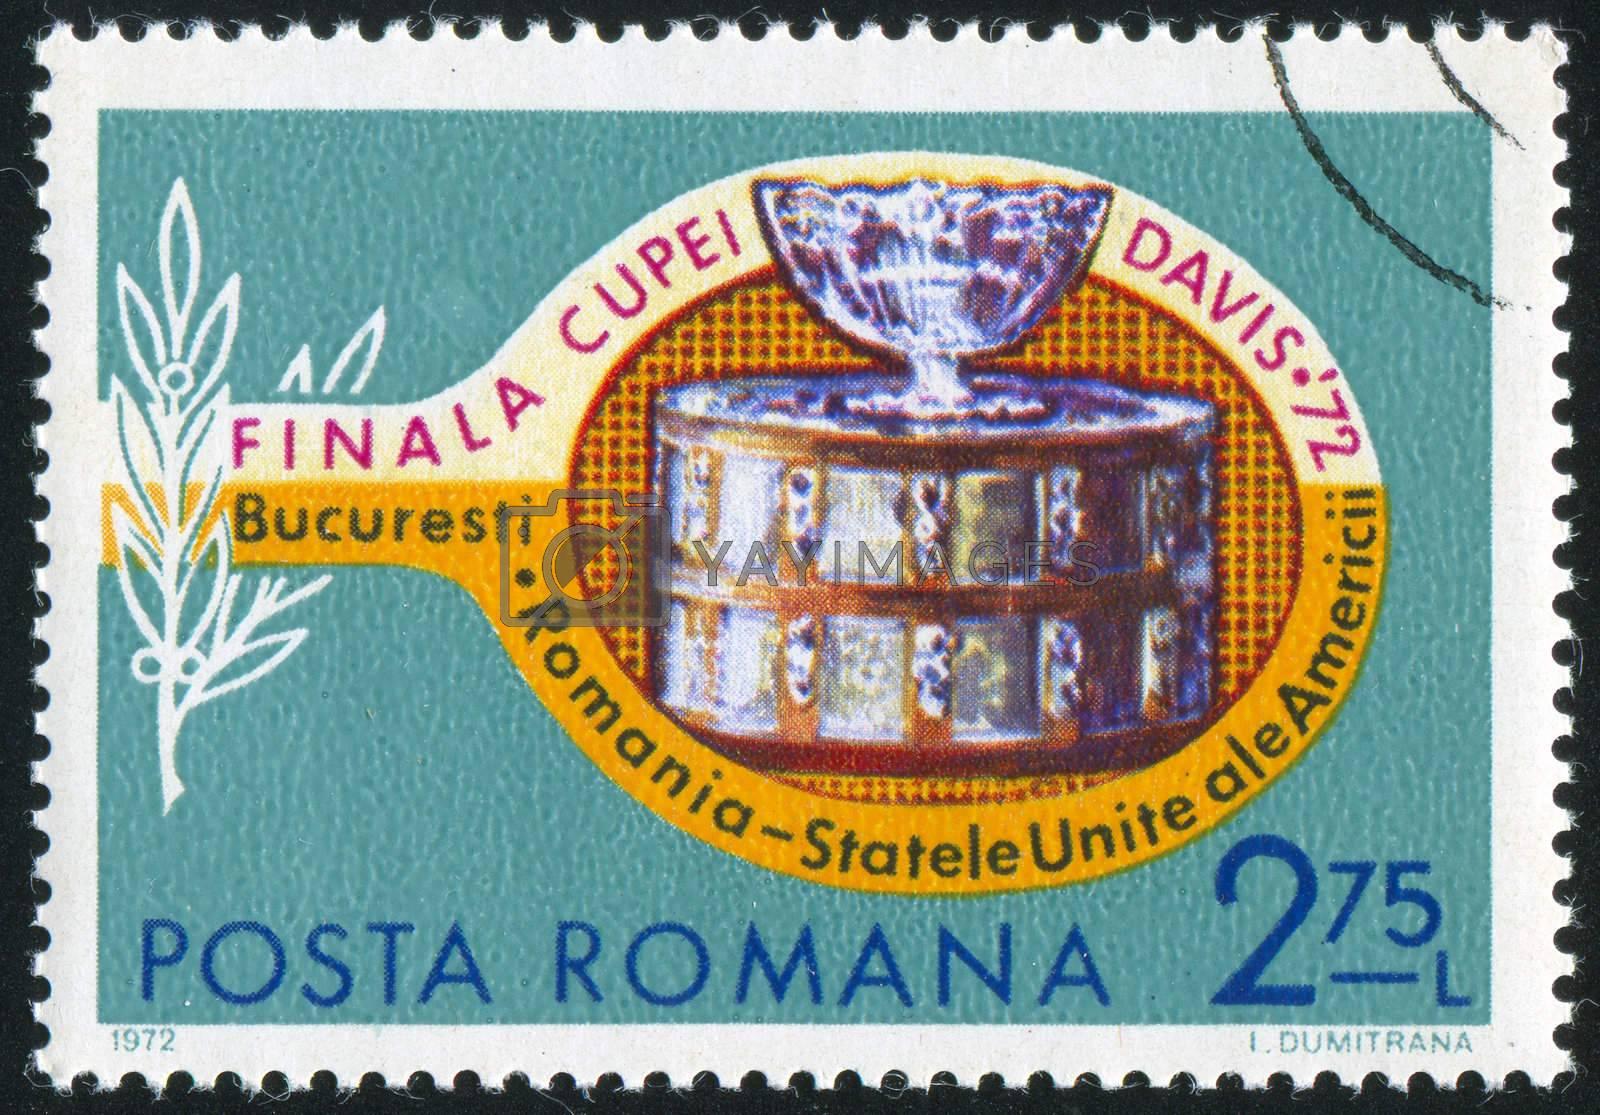 ROMANIA - CIRCA 1972: stamp printed by Romania, shows tennis racket and Davis cup, circa 1972